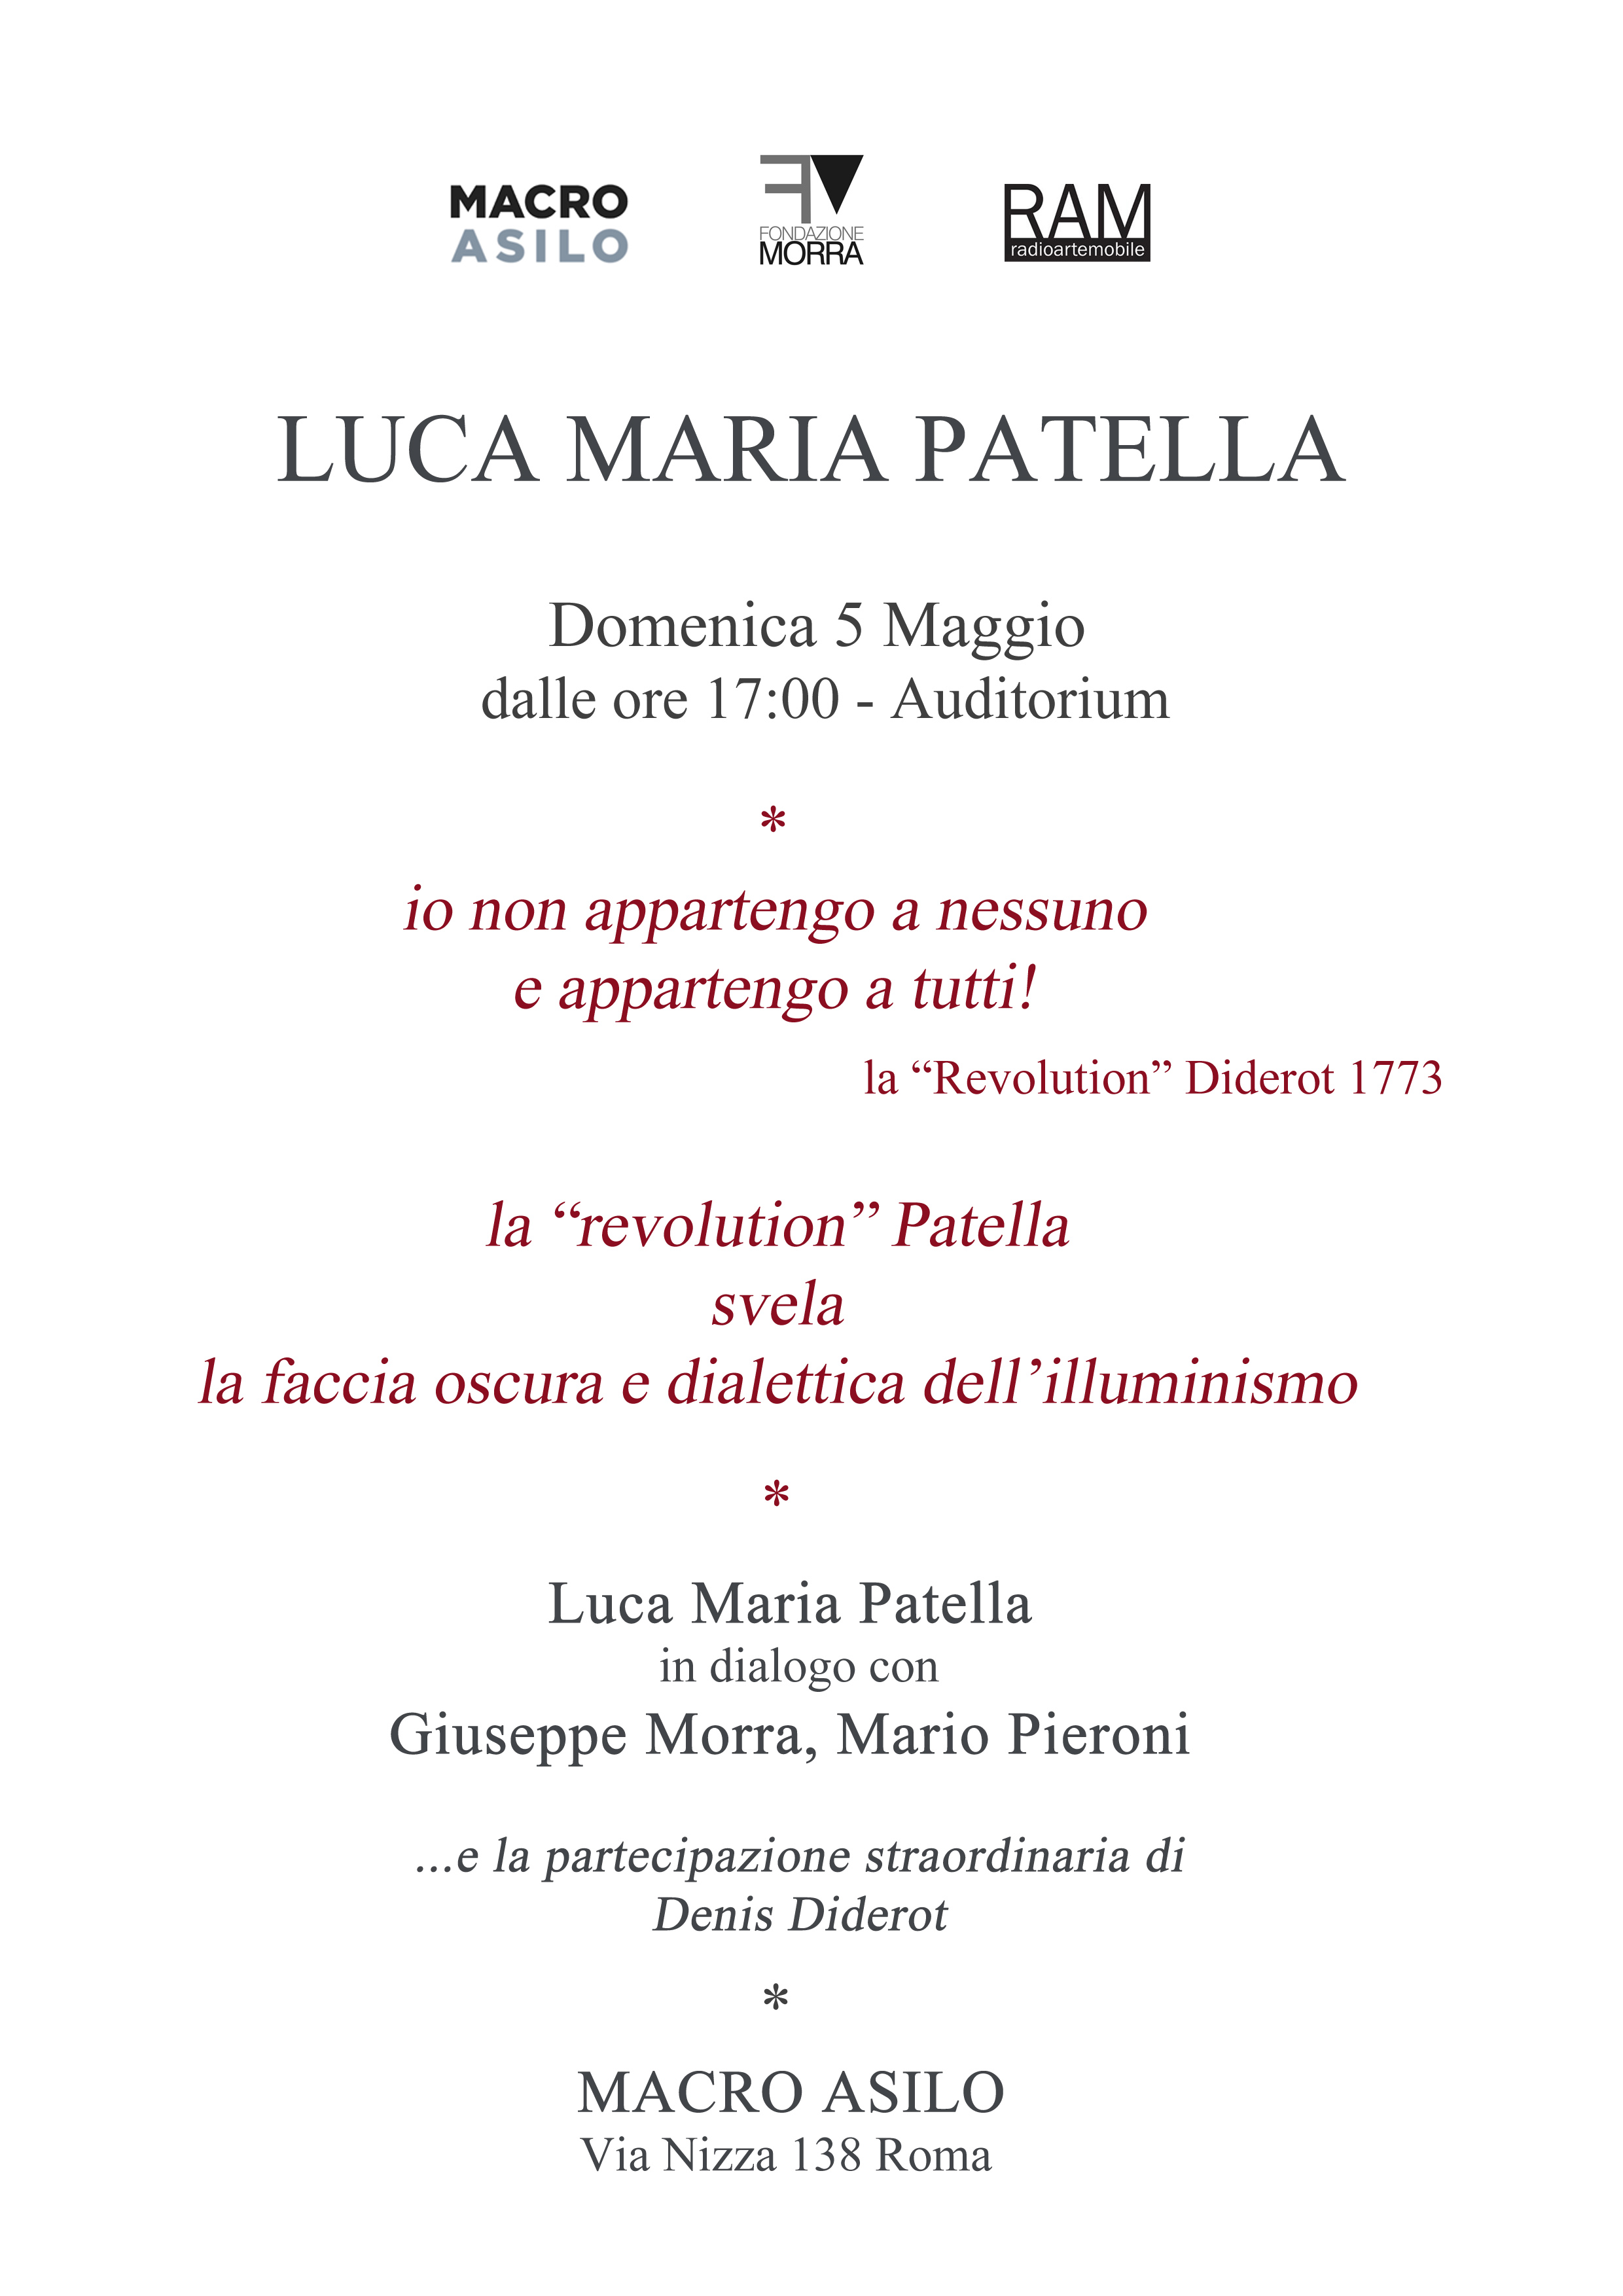 Banner Luca Maria Patella Macro Asilo